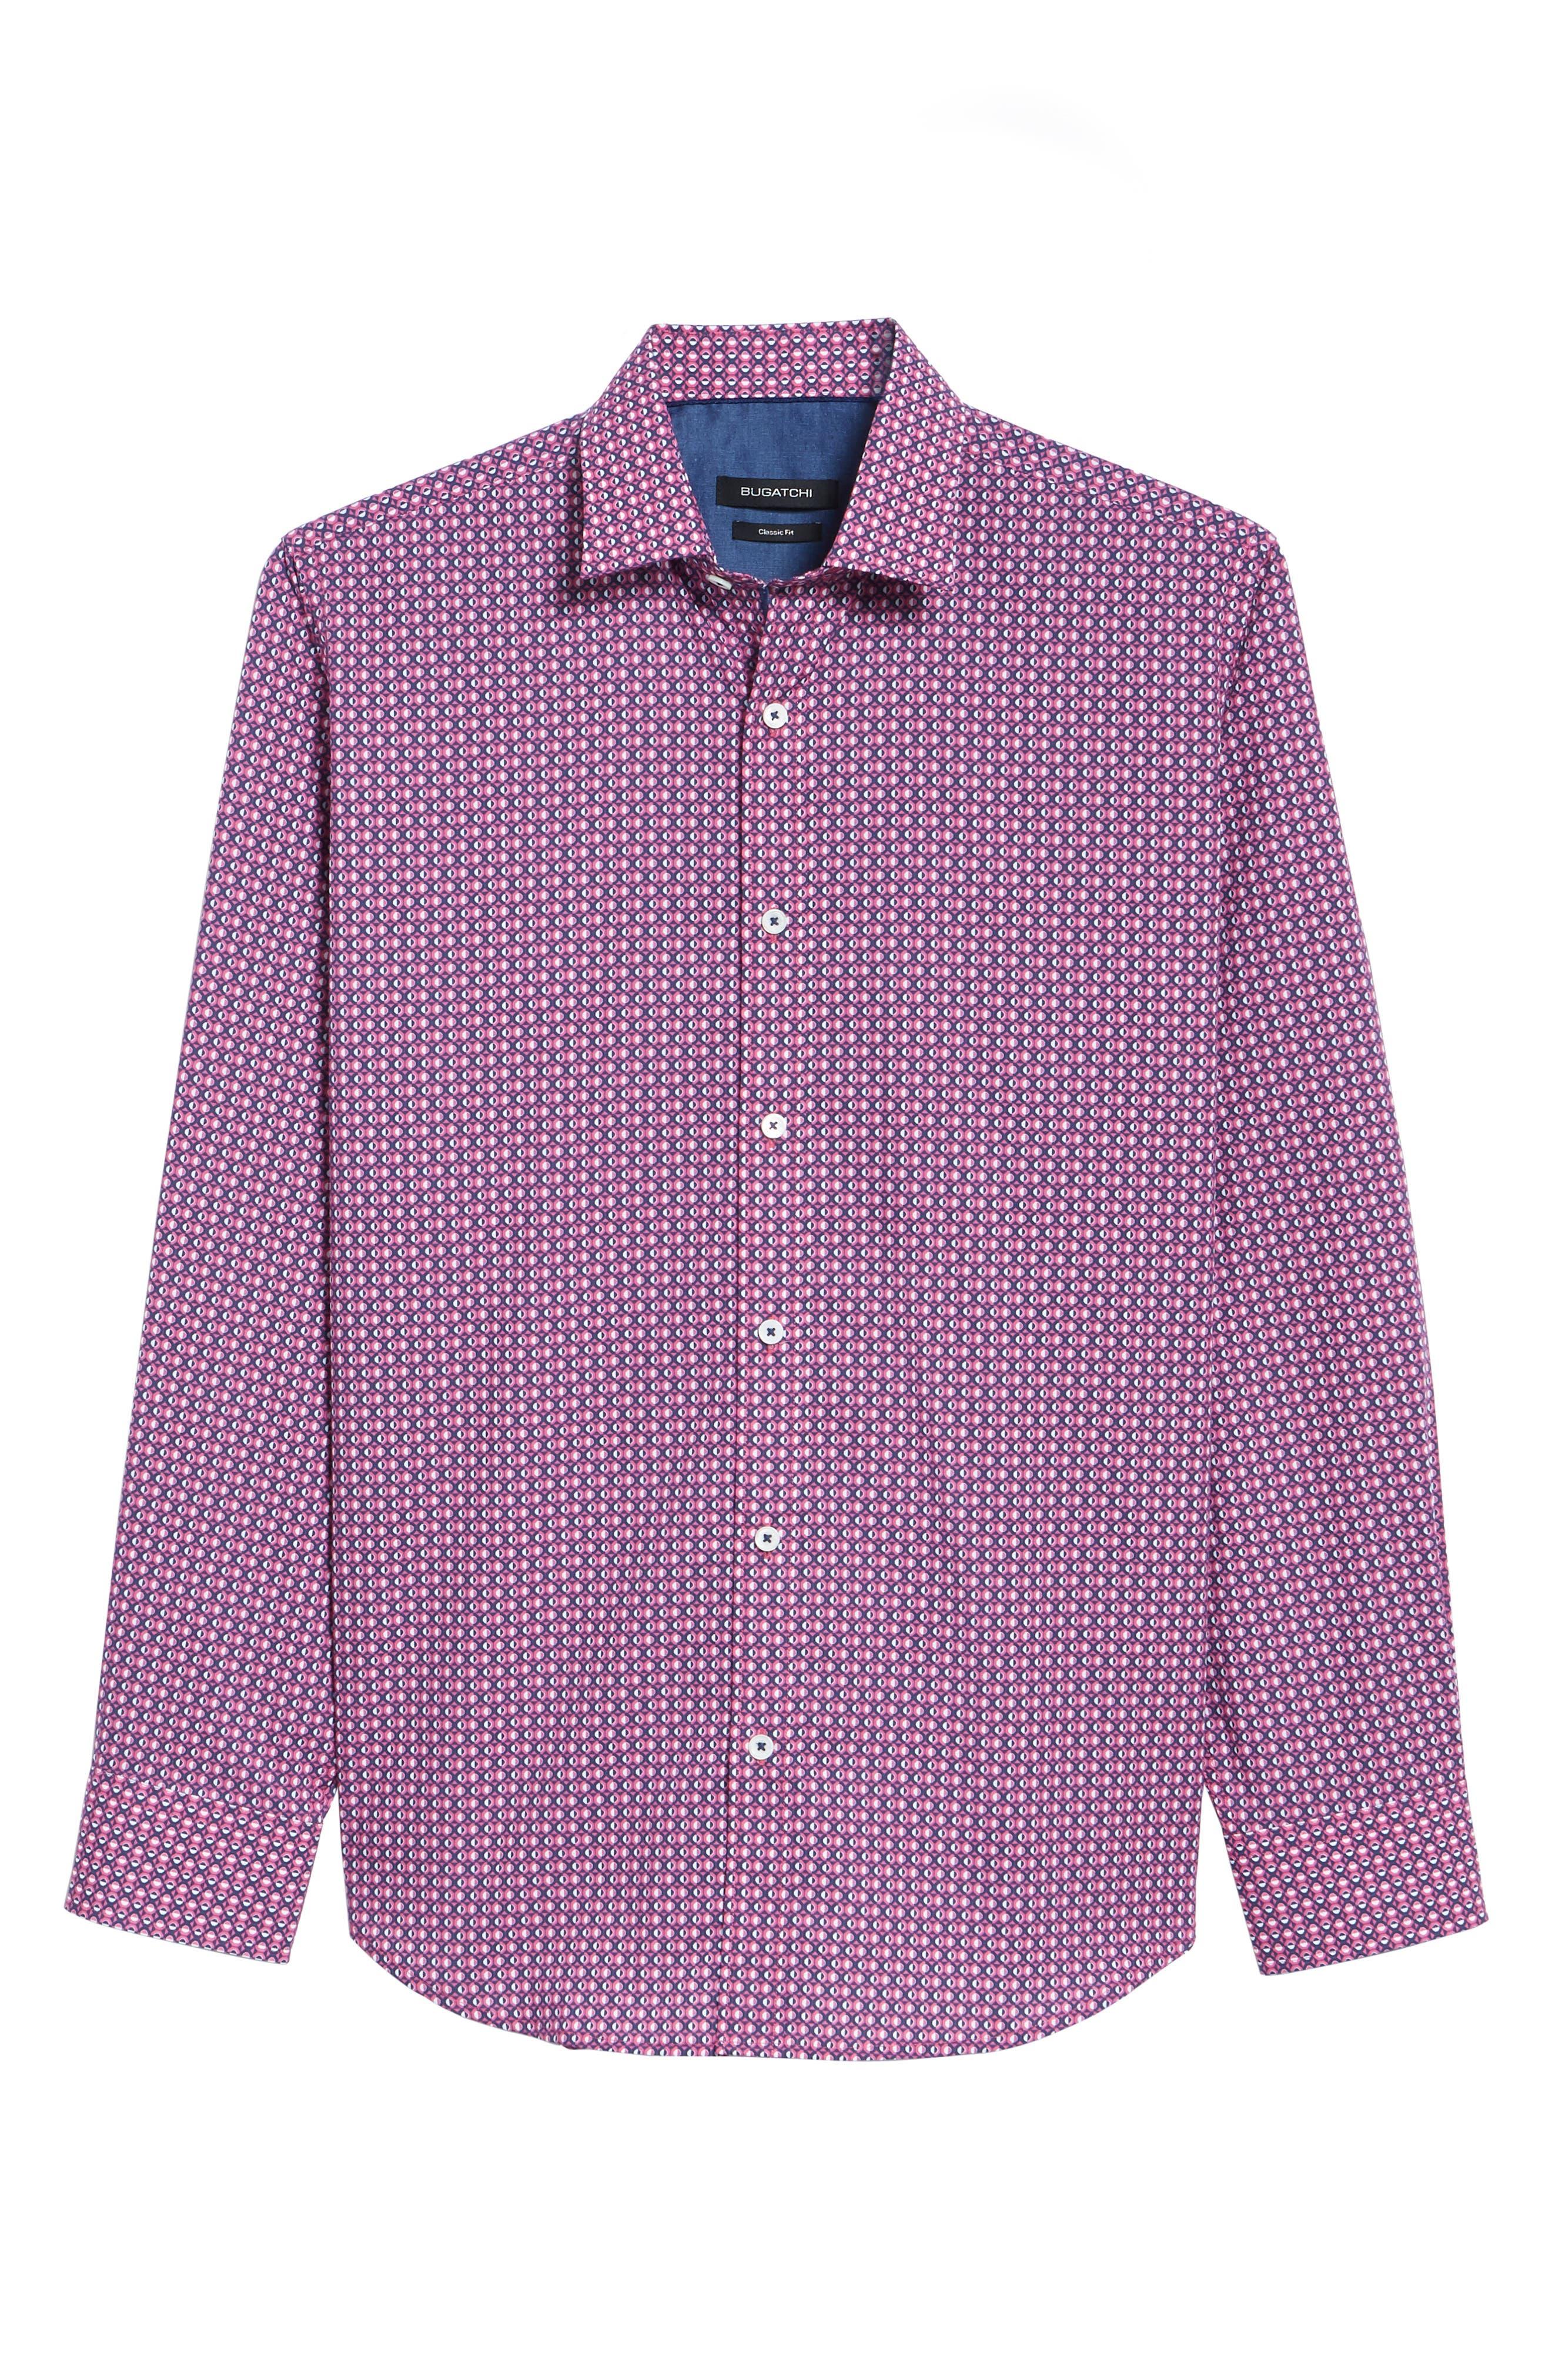 Classic Fit Woven Sport Shirt,                             Alternate thumbnail 6, color,                             Magenta